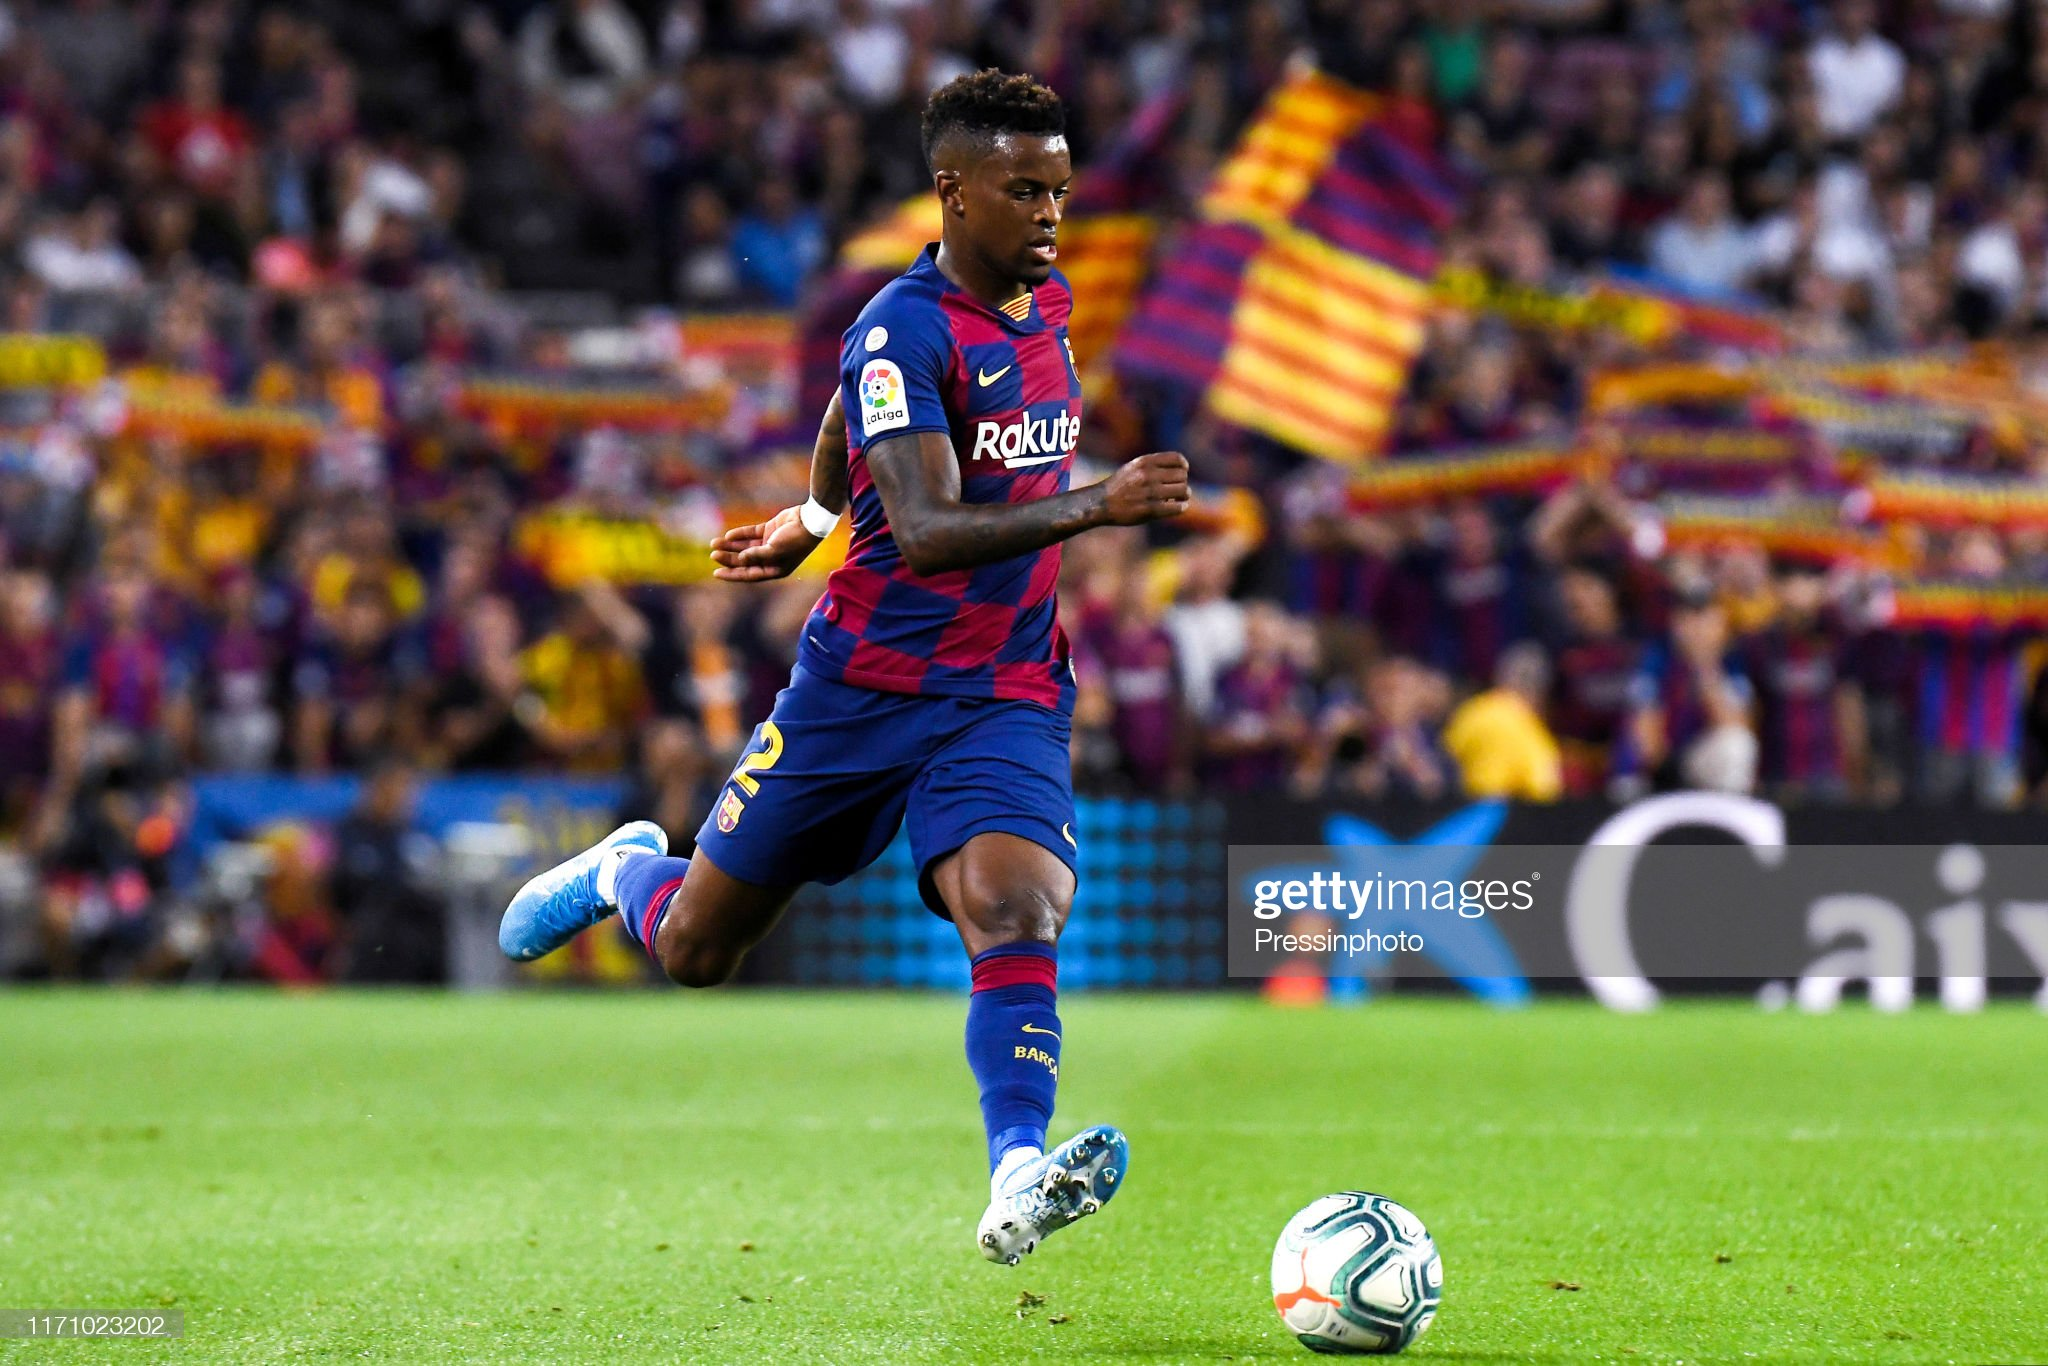 صور مباراة : برشلونة - فياريال 2-1 ( 24-09-2019 )  Nelson-semedo-of-fc-barcelona-during-the-liga-match-between-barcelona-picture-id1171023202?s=2048x2048